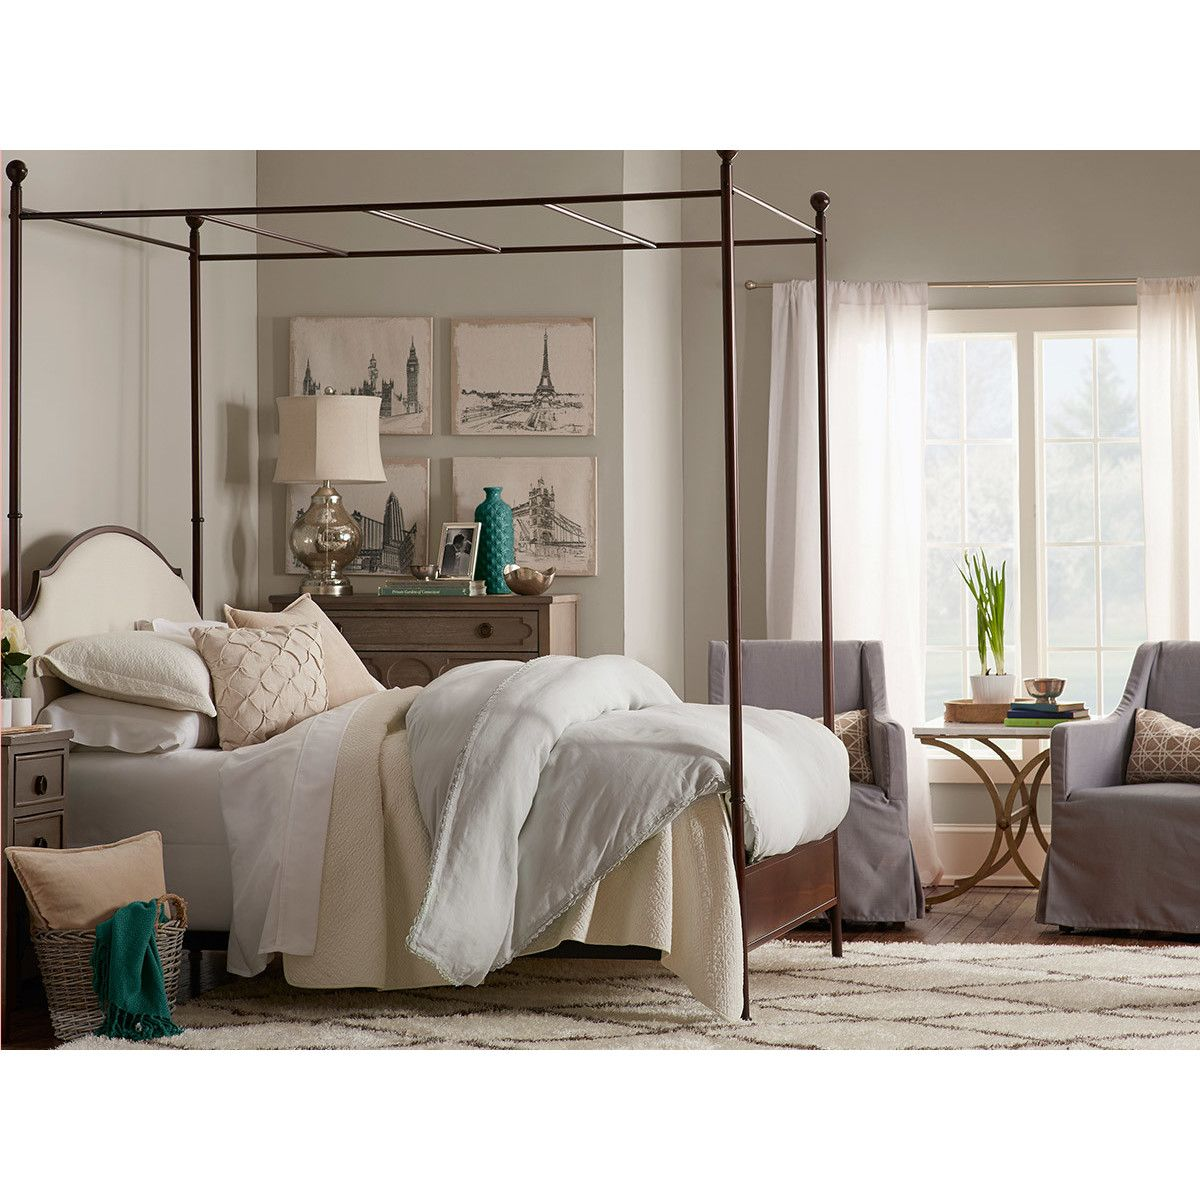 Alcott Hill Canopy Bed Furniture, Farmhouse master